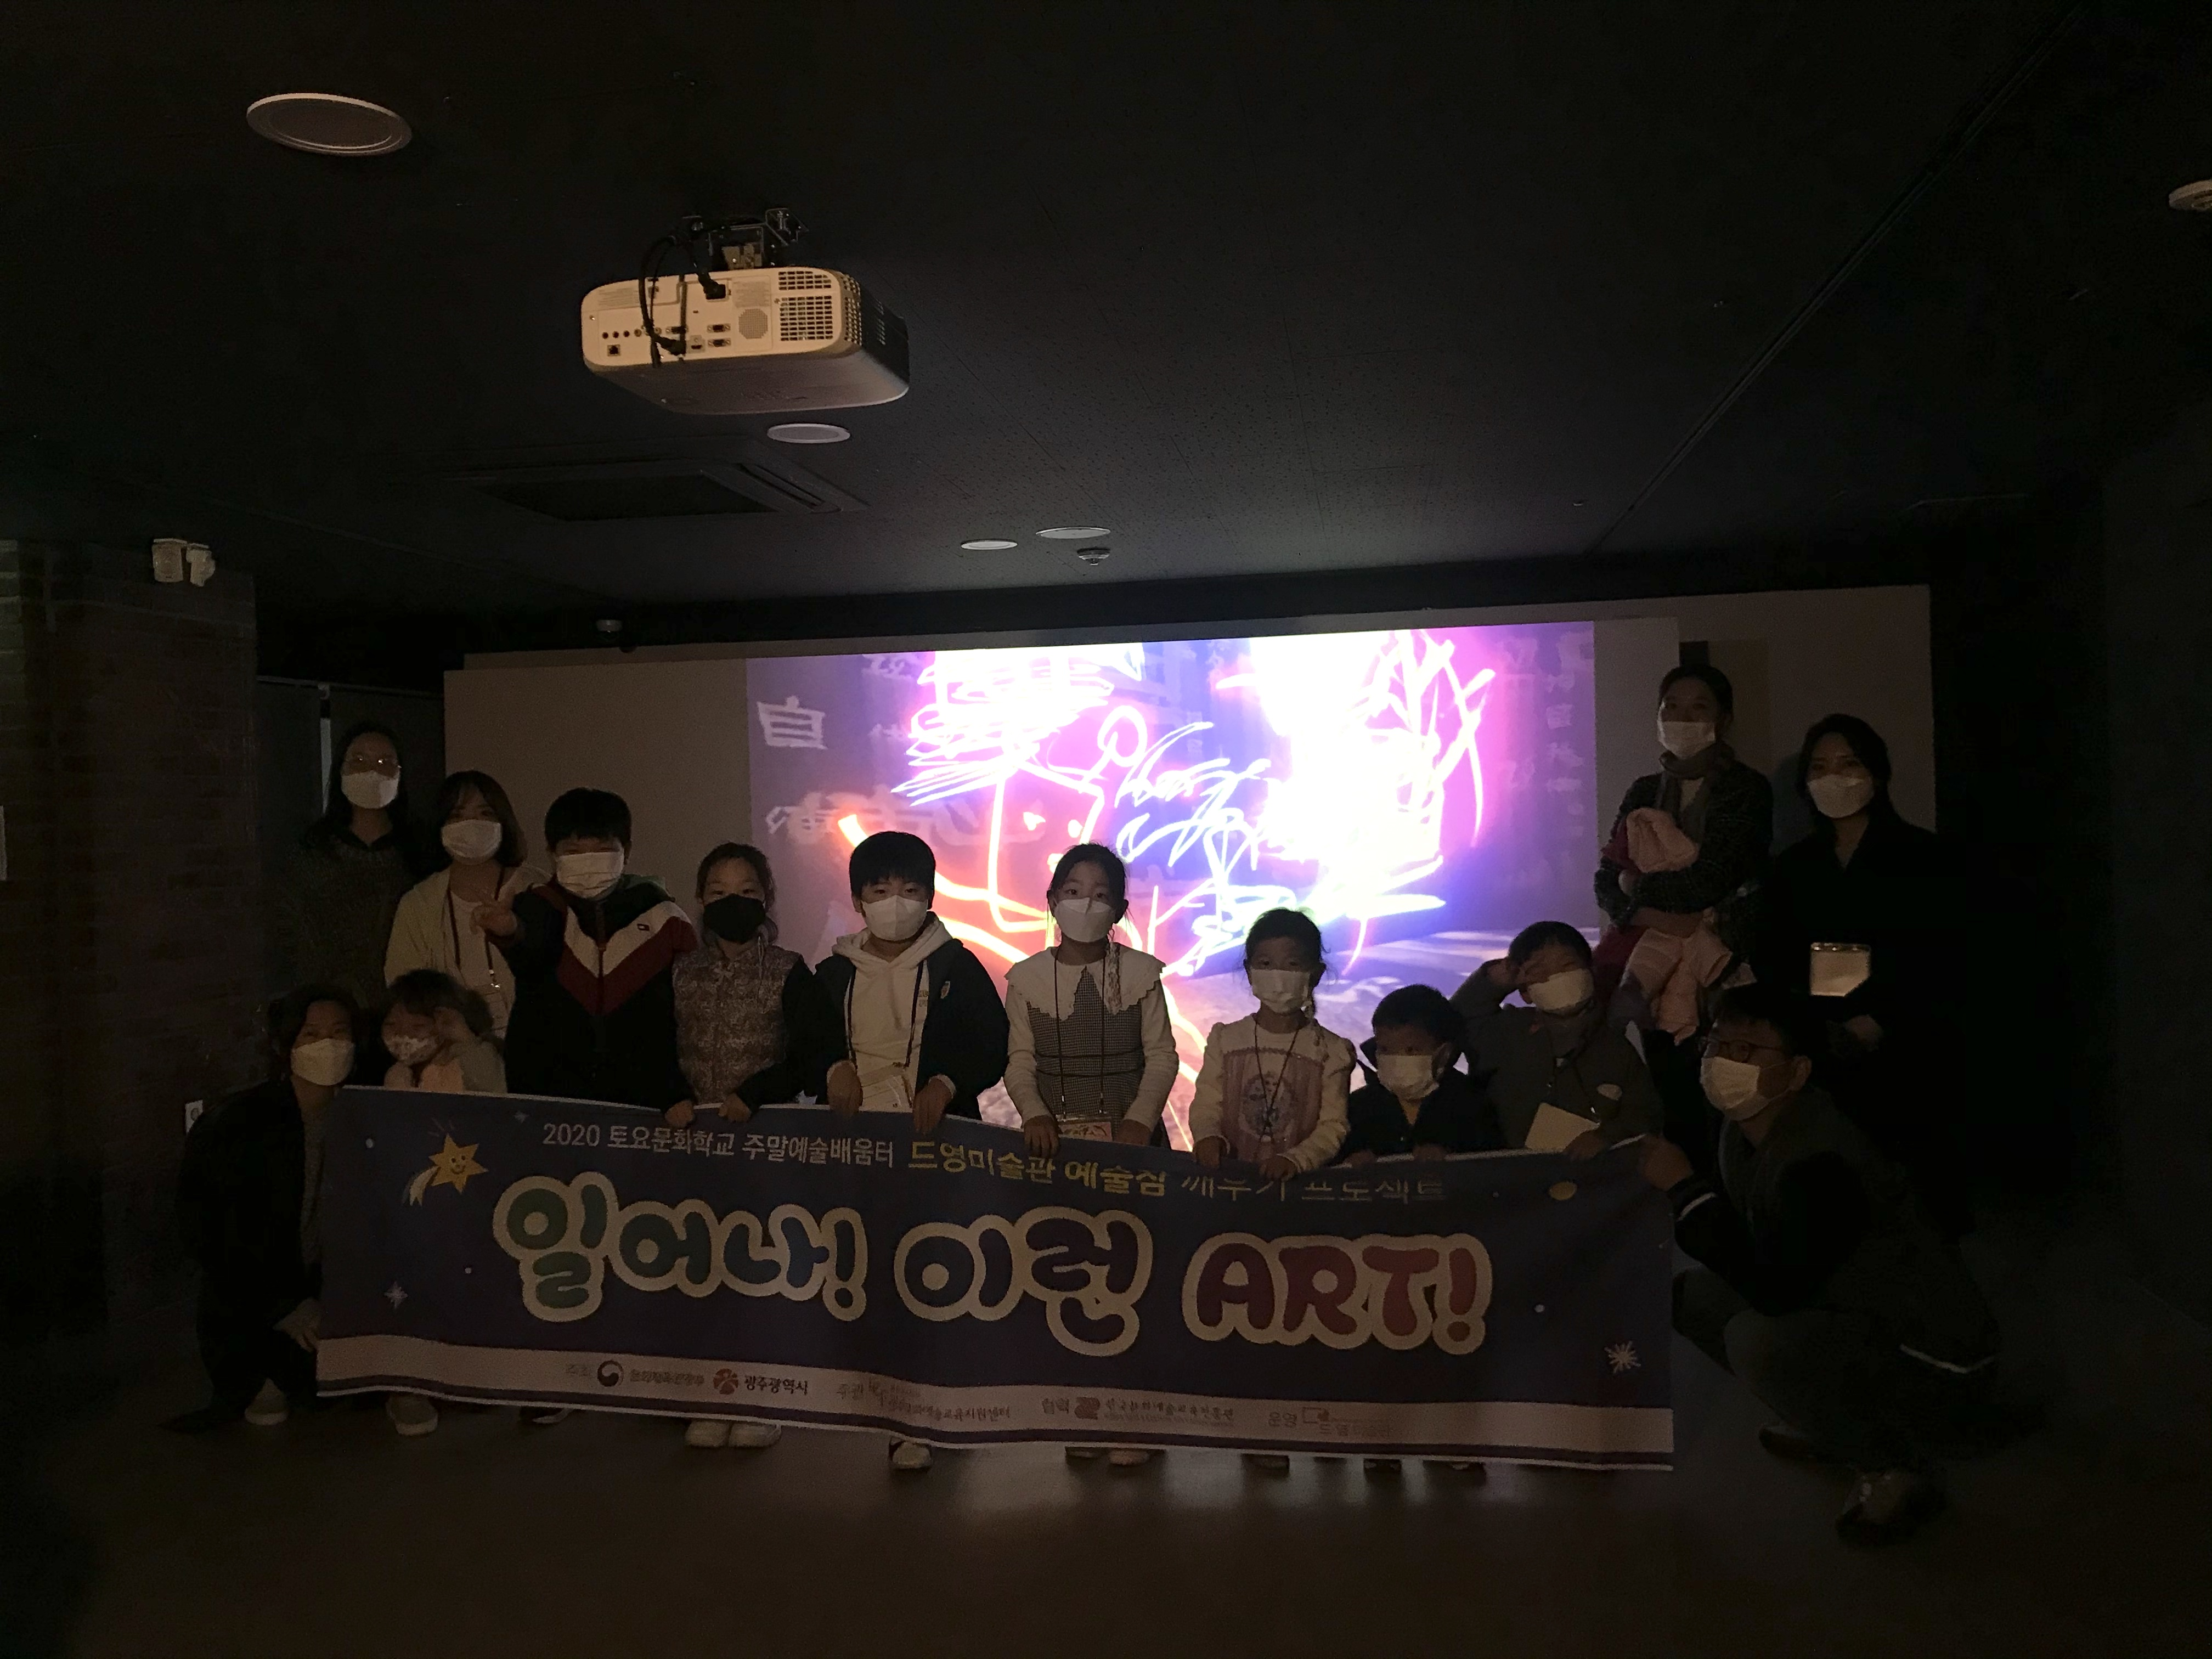 http://www.deyoungmuseum.co.kr/bs/se2/imgup/1606376296KakaoTalk_20201126_134605870.jpg